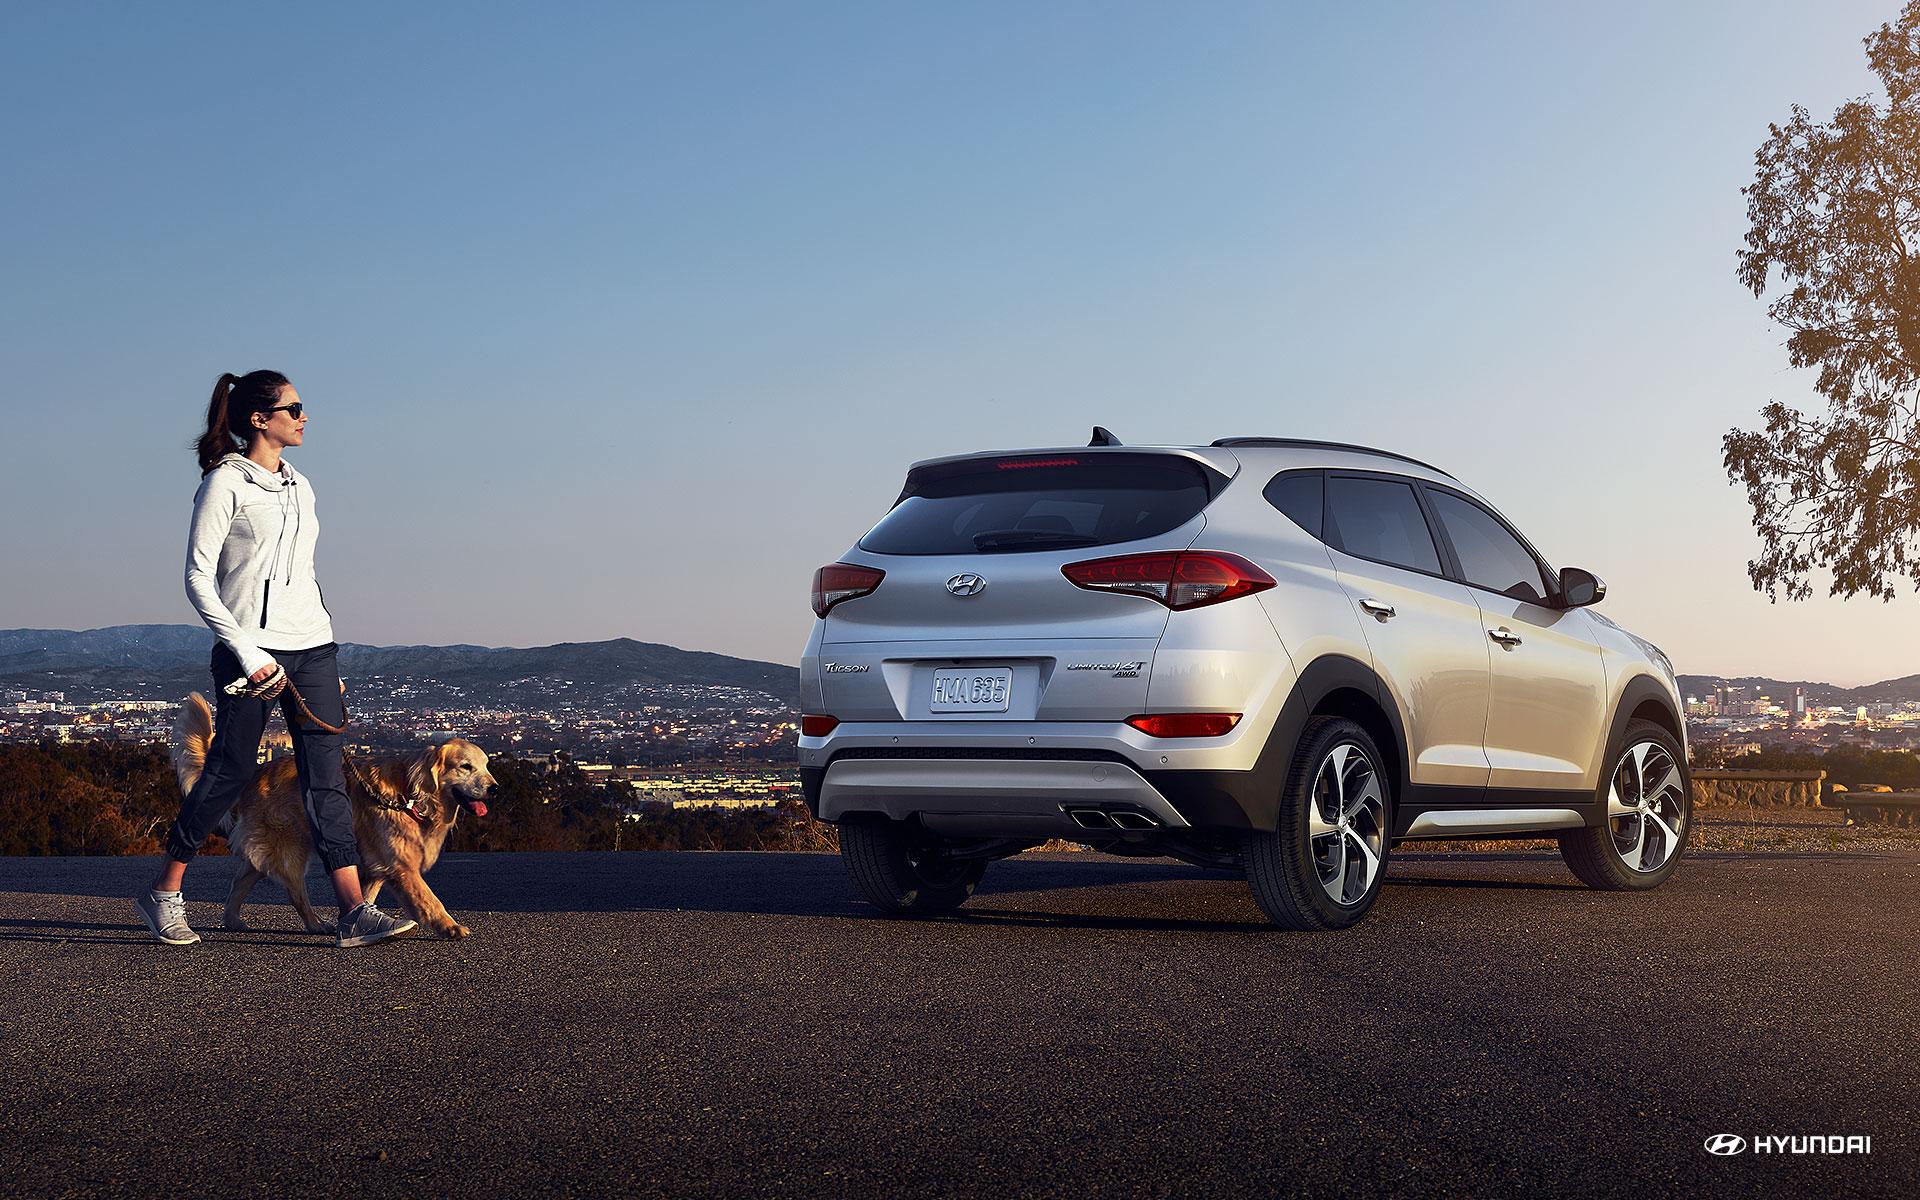 How to Pair Hyundai Models With Summer Holidays